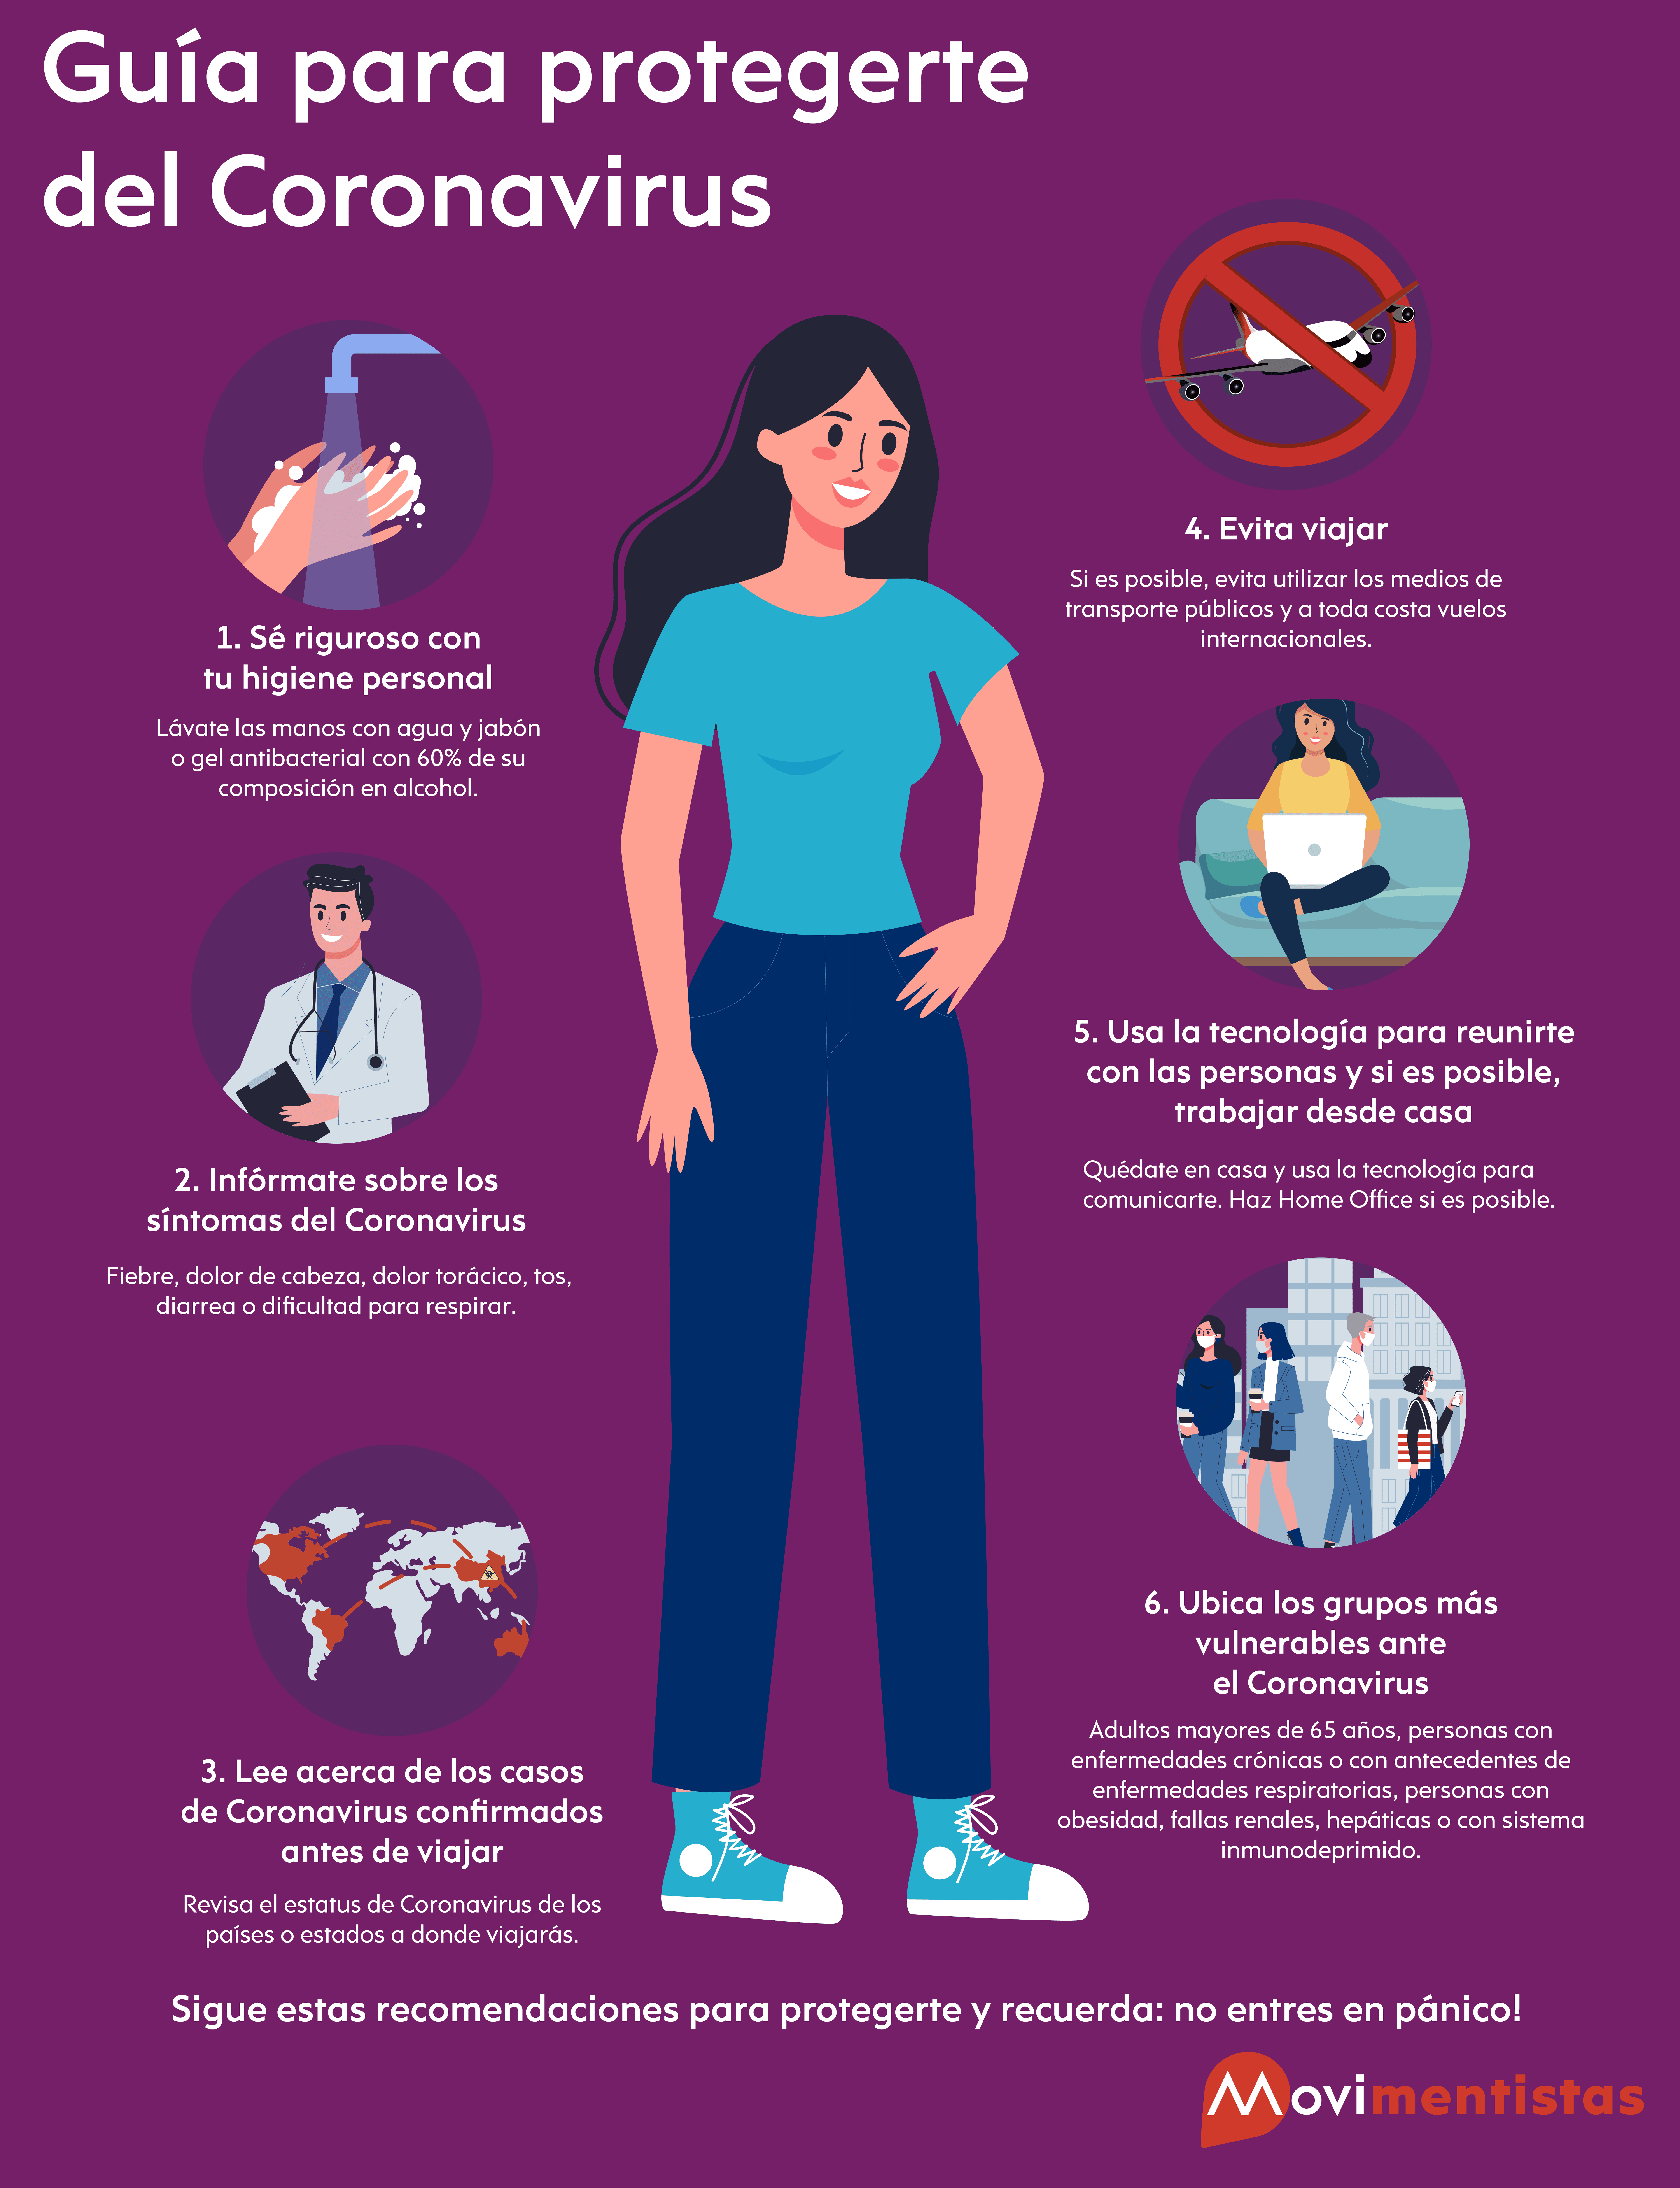 Infografia con instructiones para protegerte del Coronavirus